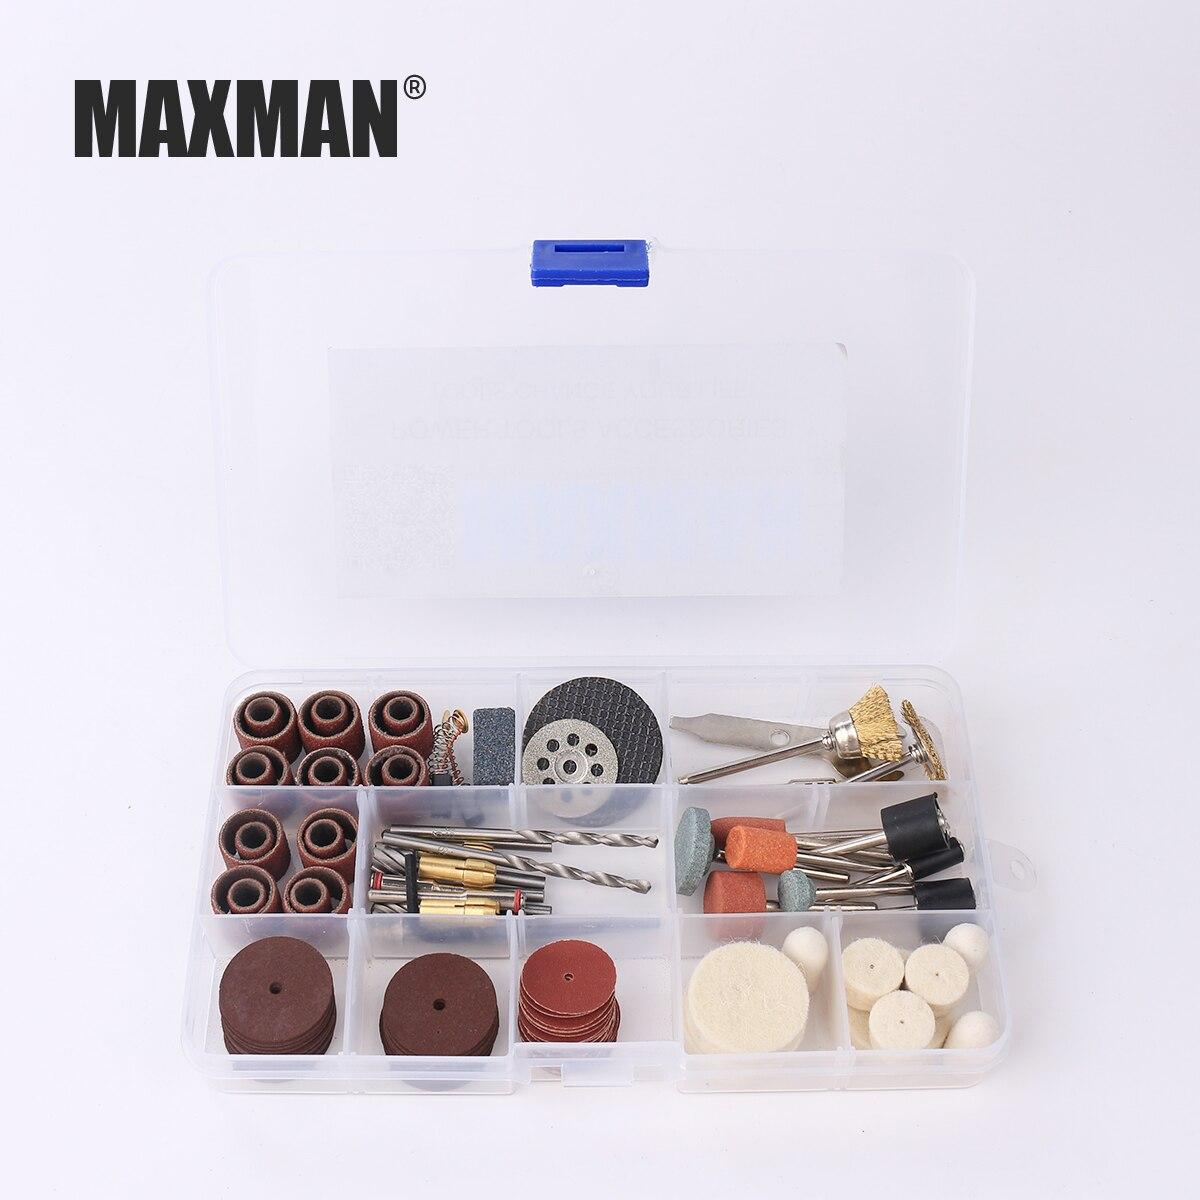 MAXMAN 256Pcs Wood Metal Engraving Electric Rotary Tool Accessories for Dremel Bit Set Grinding Polish Cutting Sheet